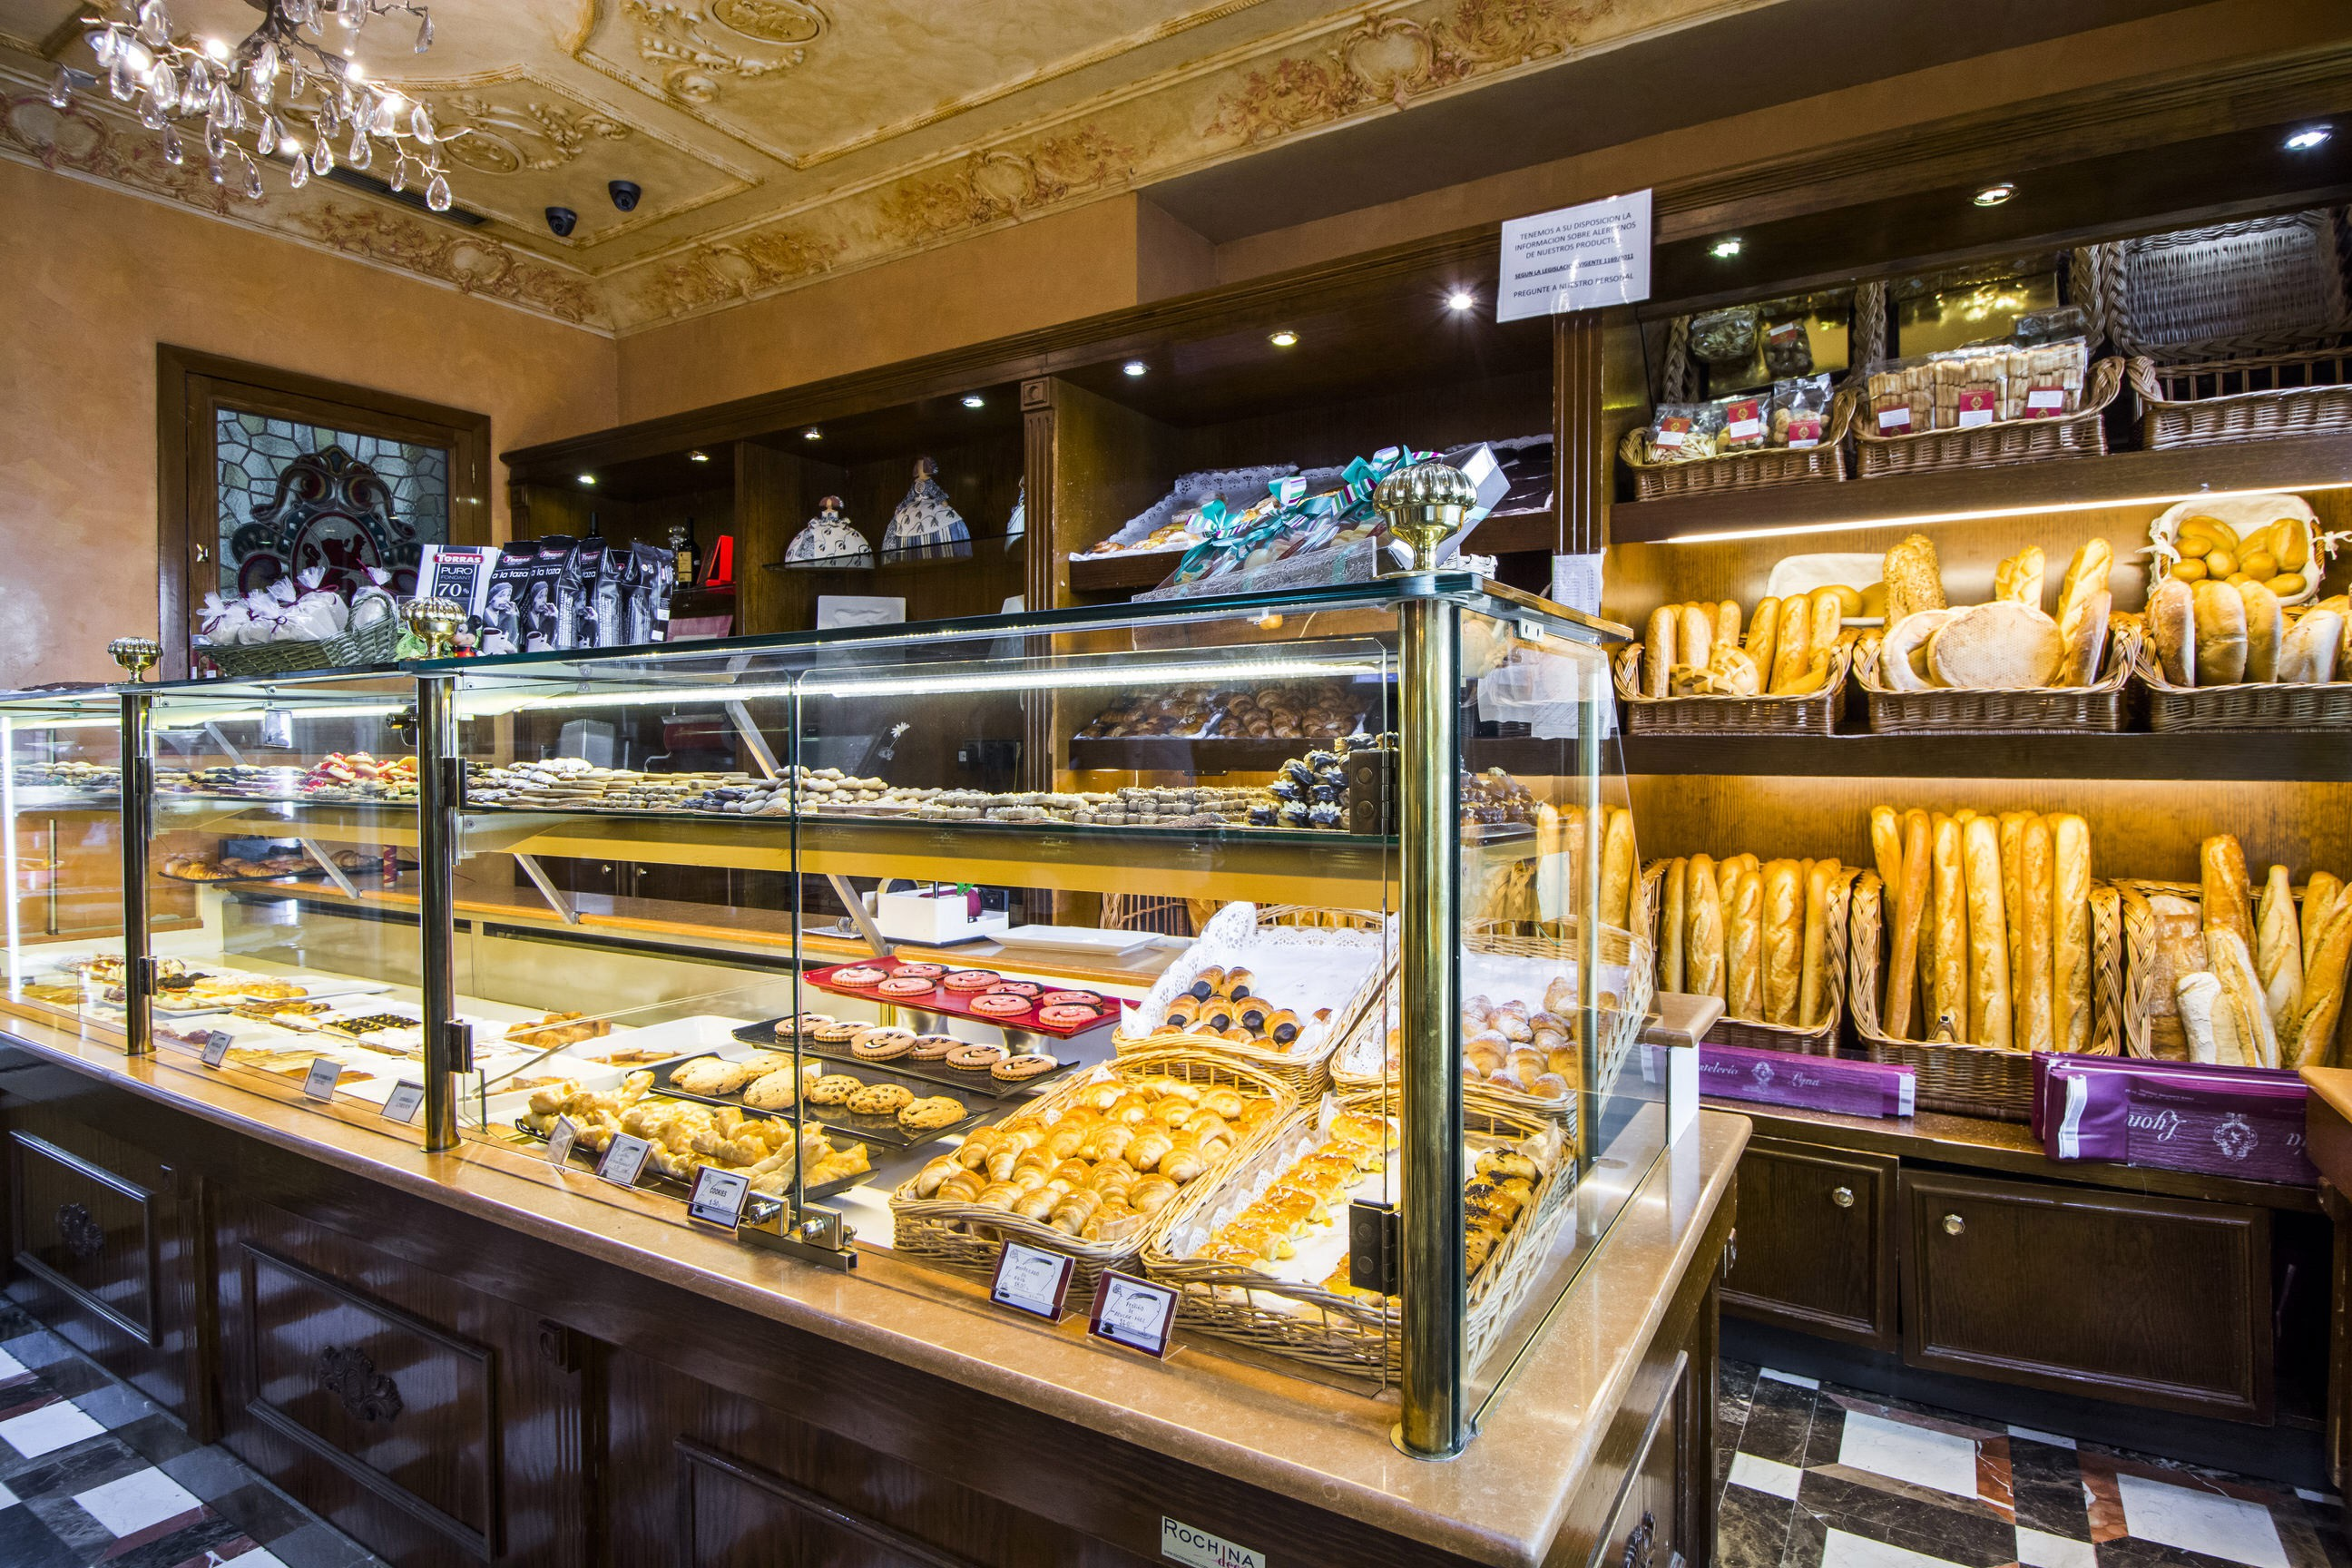 Pasteler a lyon madrid - Decoracion en espana ...